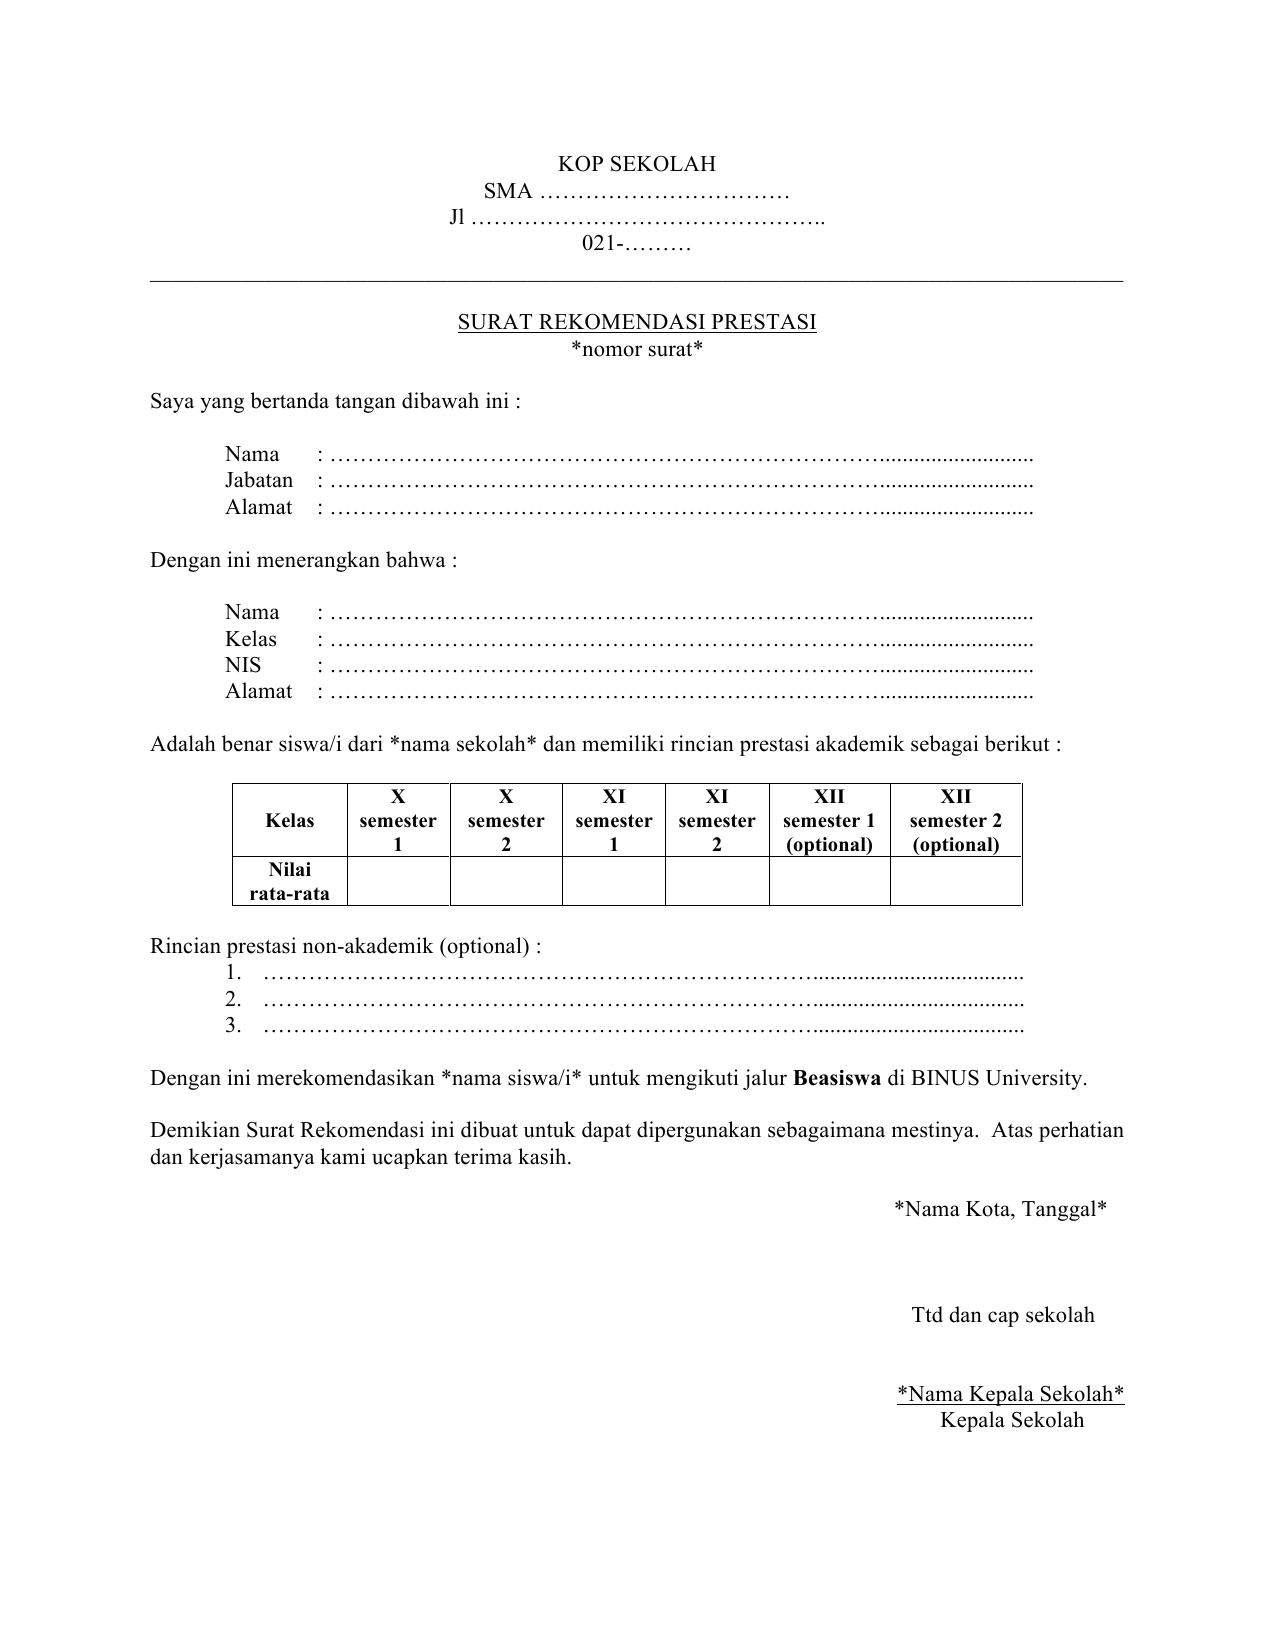 Contoh Surat Rekomendasi Kepala